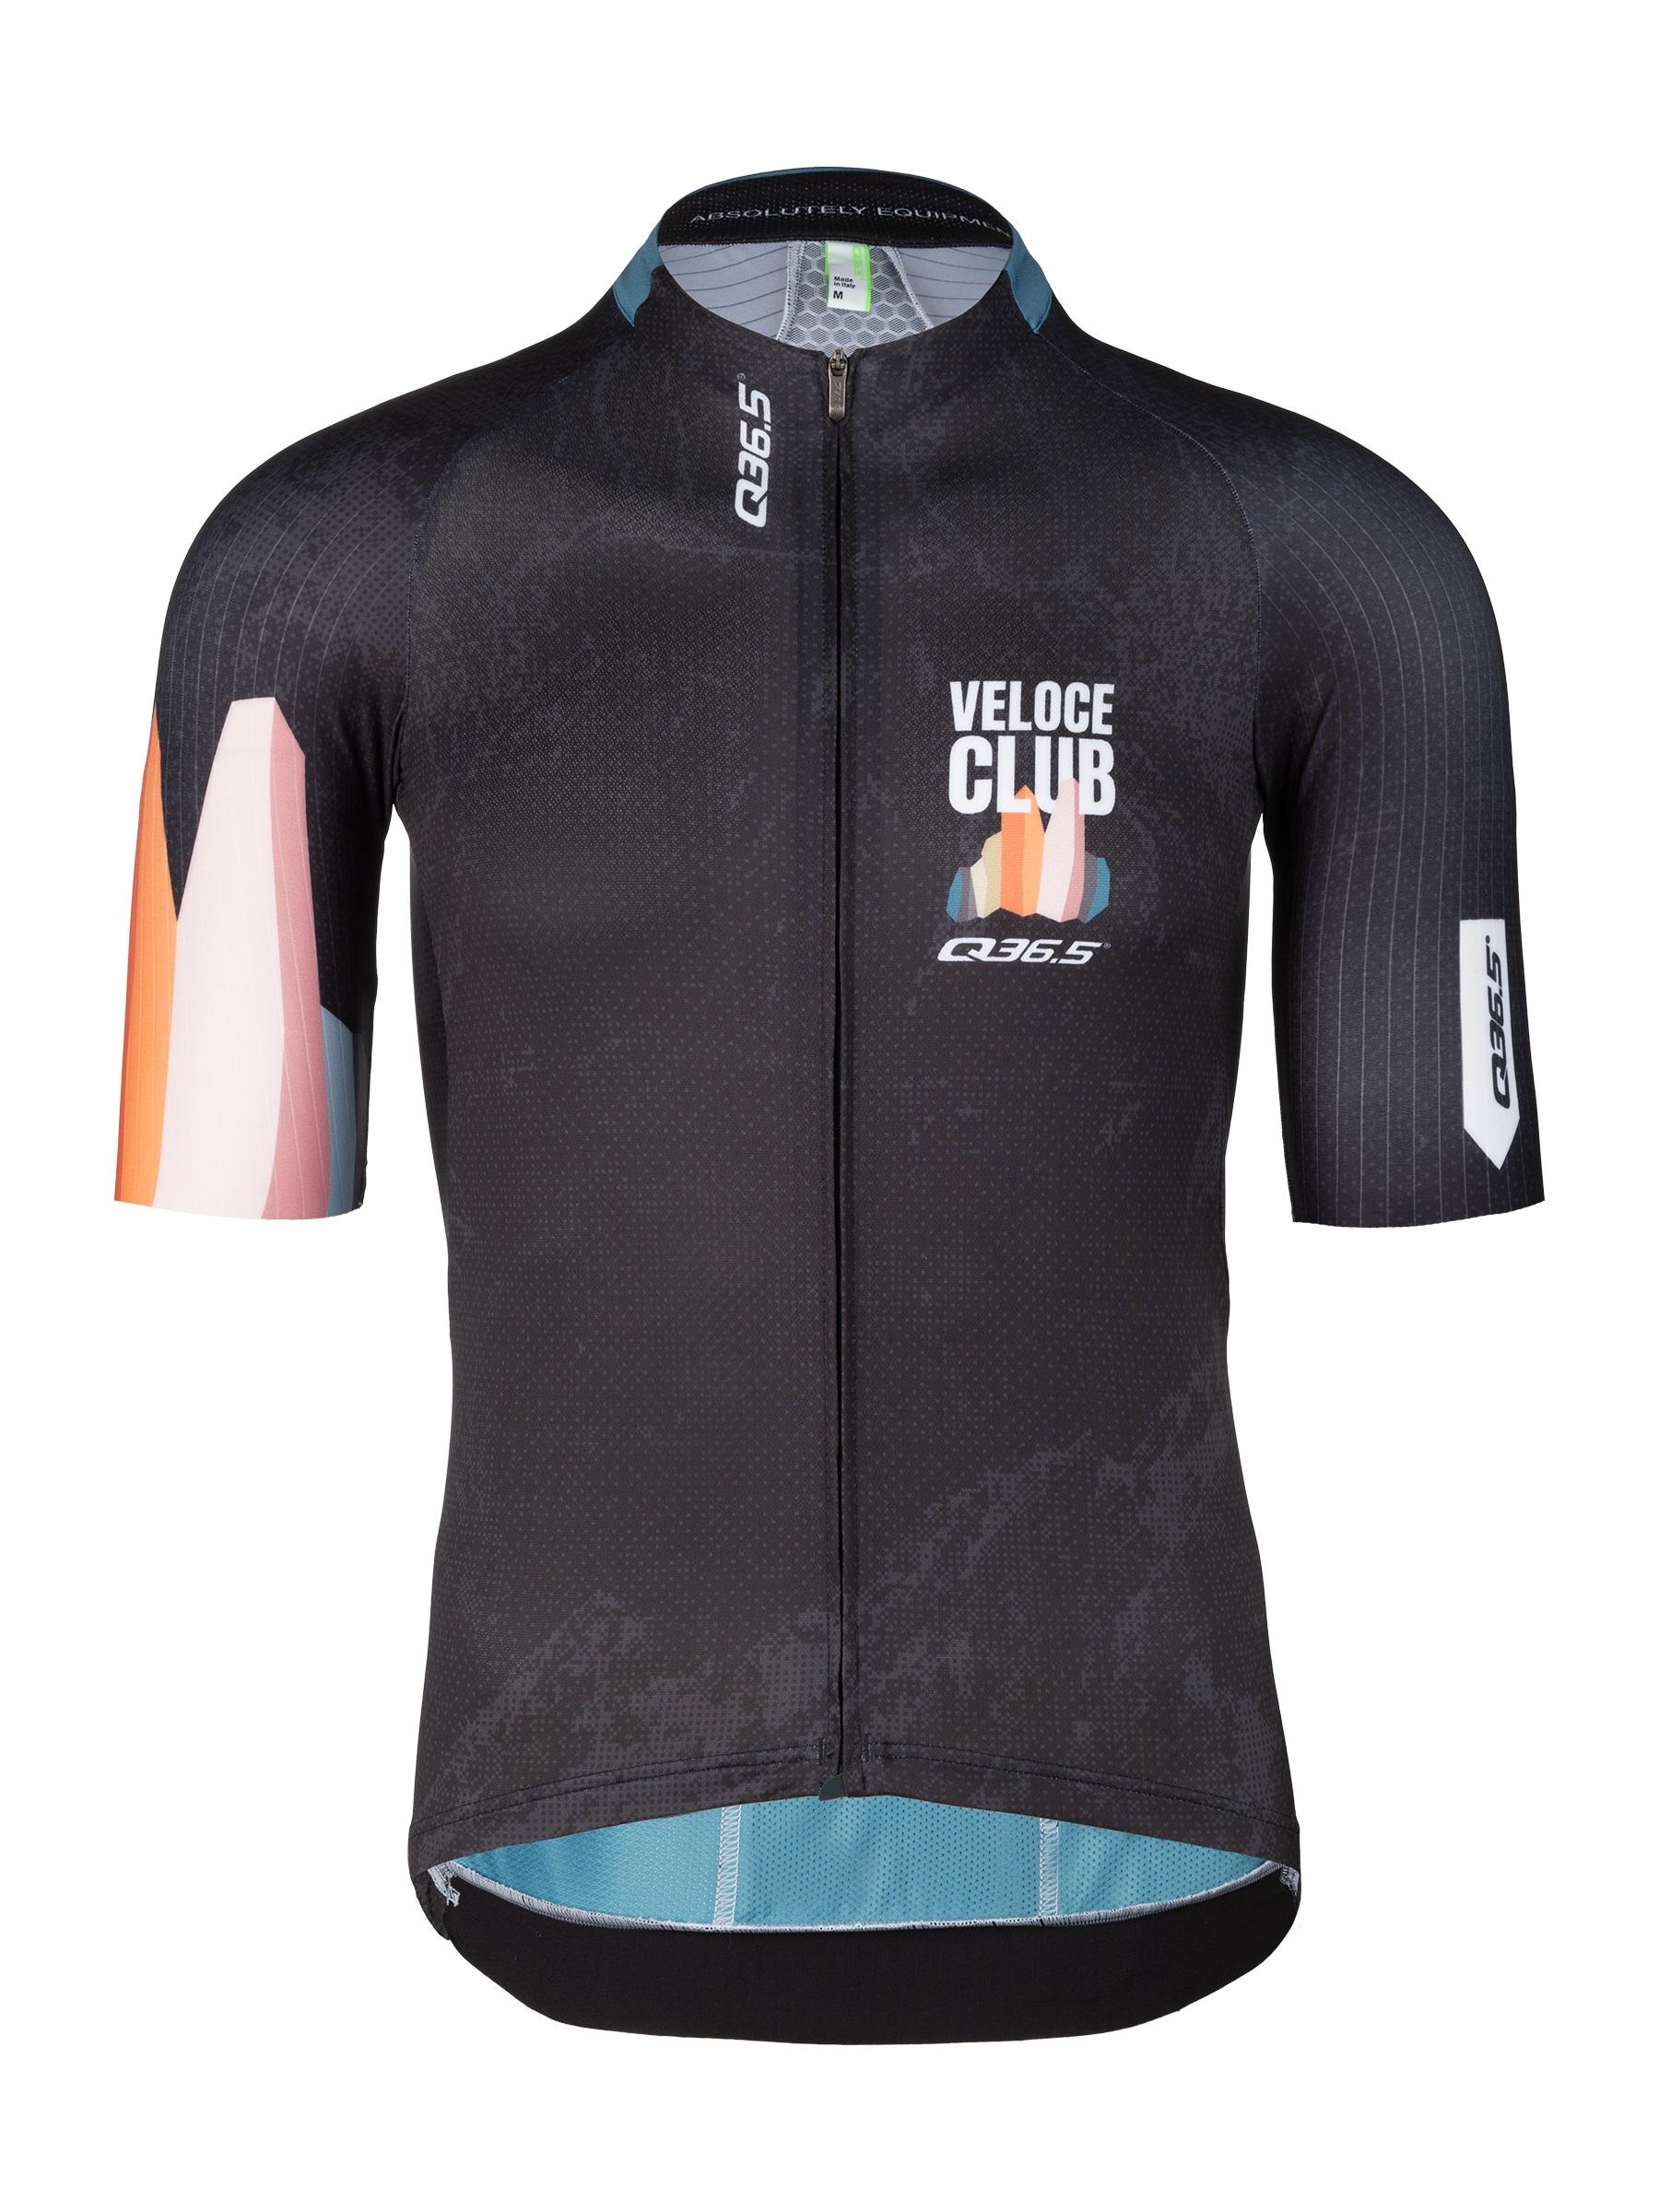 veloce-club-short-sleeve-jersey-Q36.5-031Q